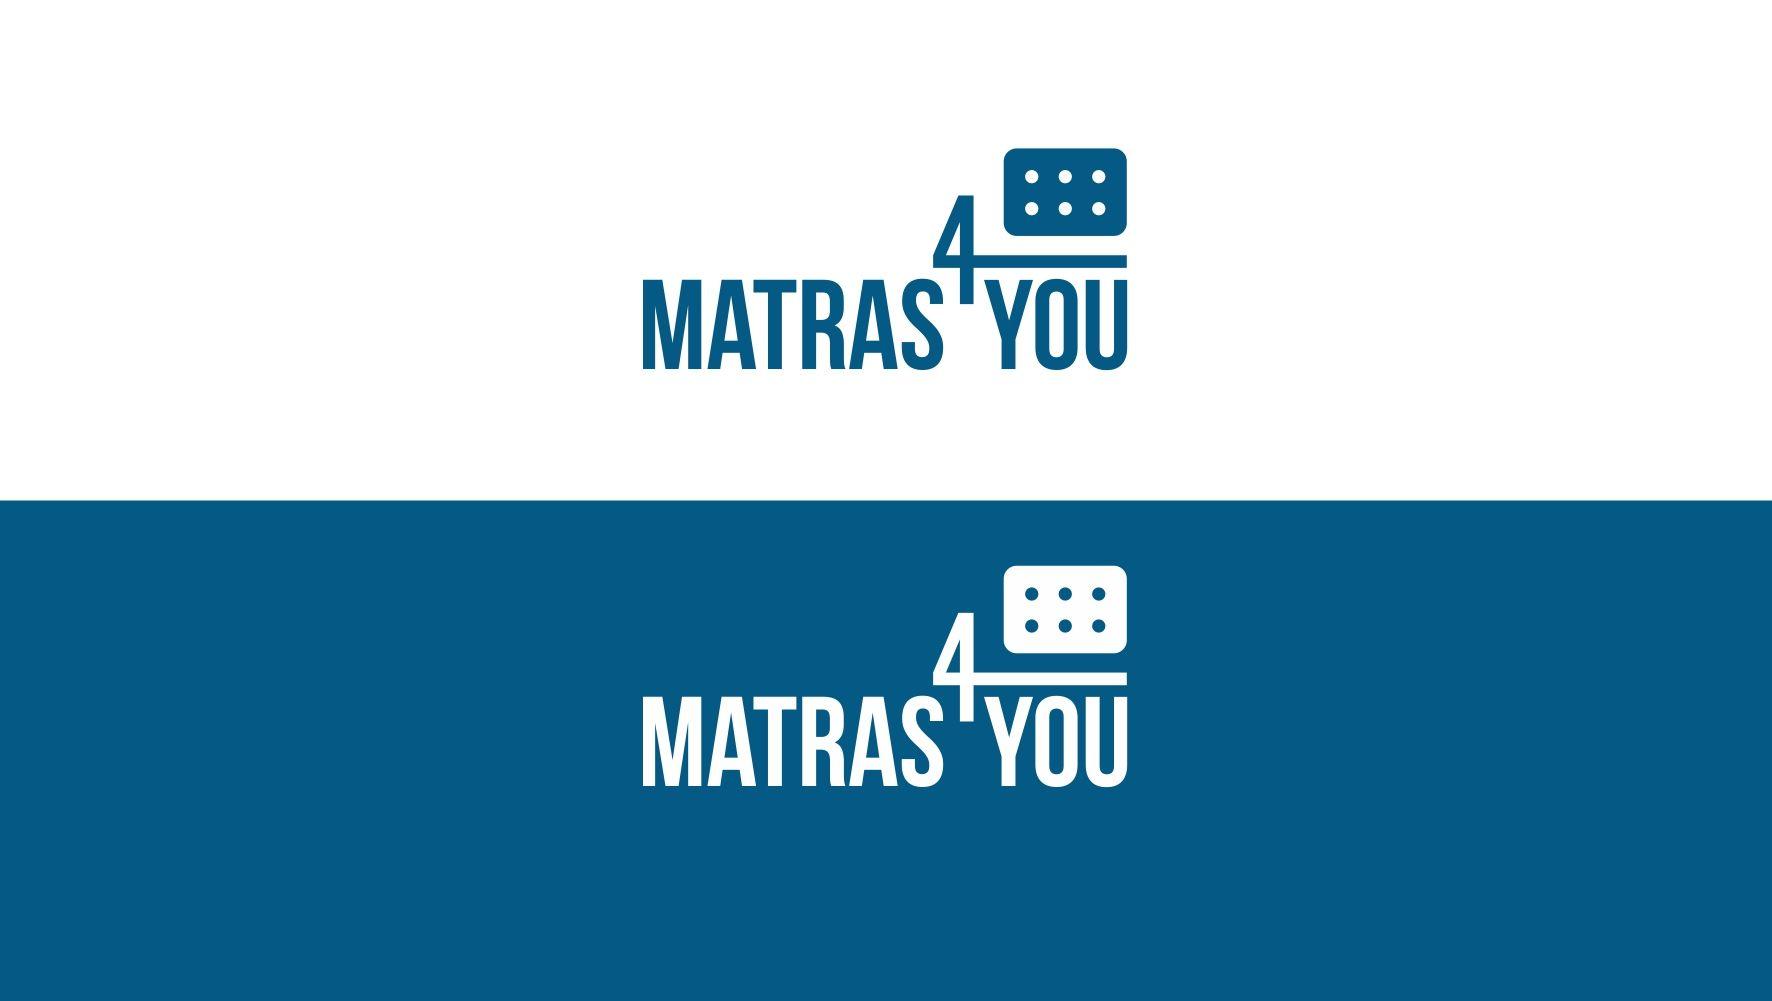 matras4u - дизайнер blukki